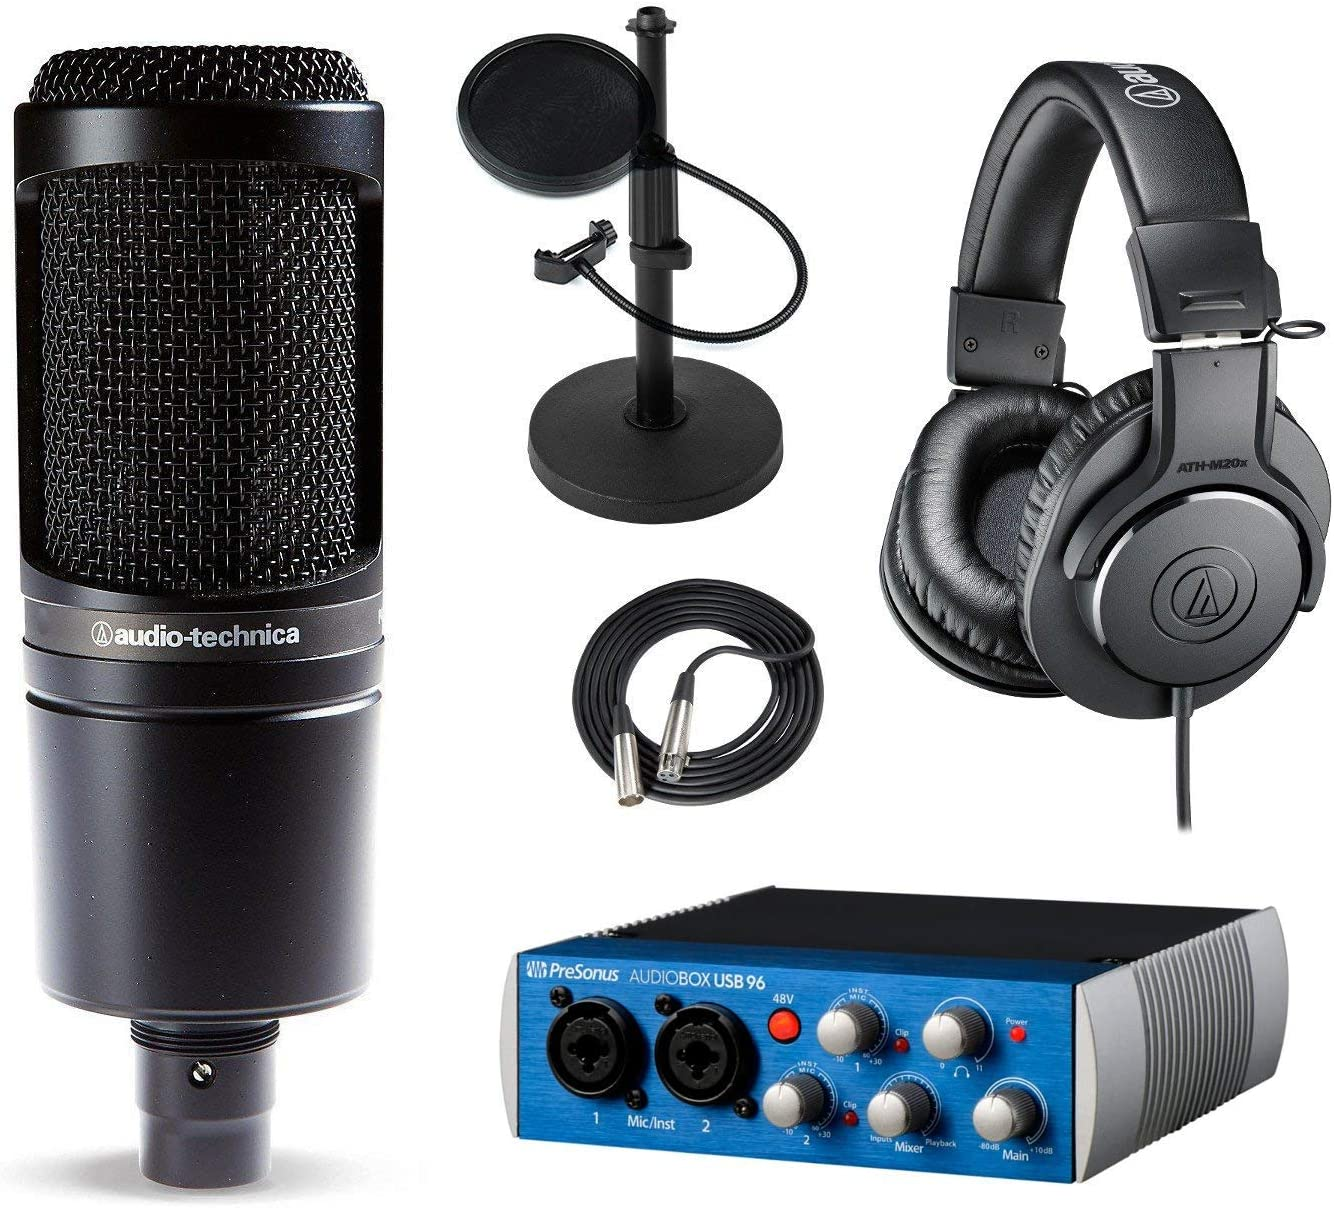 PreSonus AudioBox USB 96 and Bundle Recording 送料無料 激安 お買い得 セール価格 キ゛フト AT2020 Studio